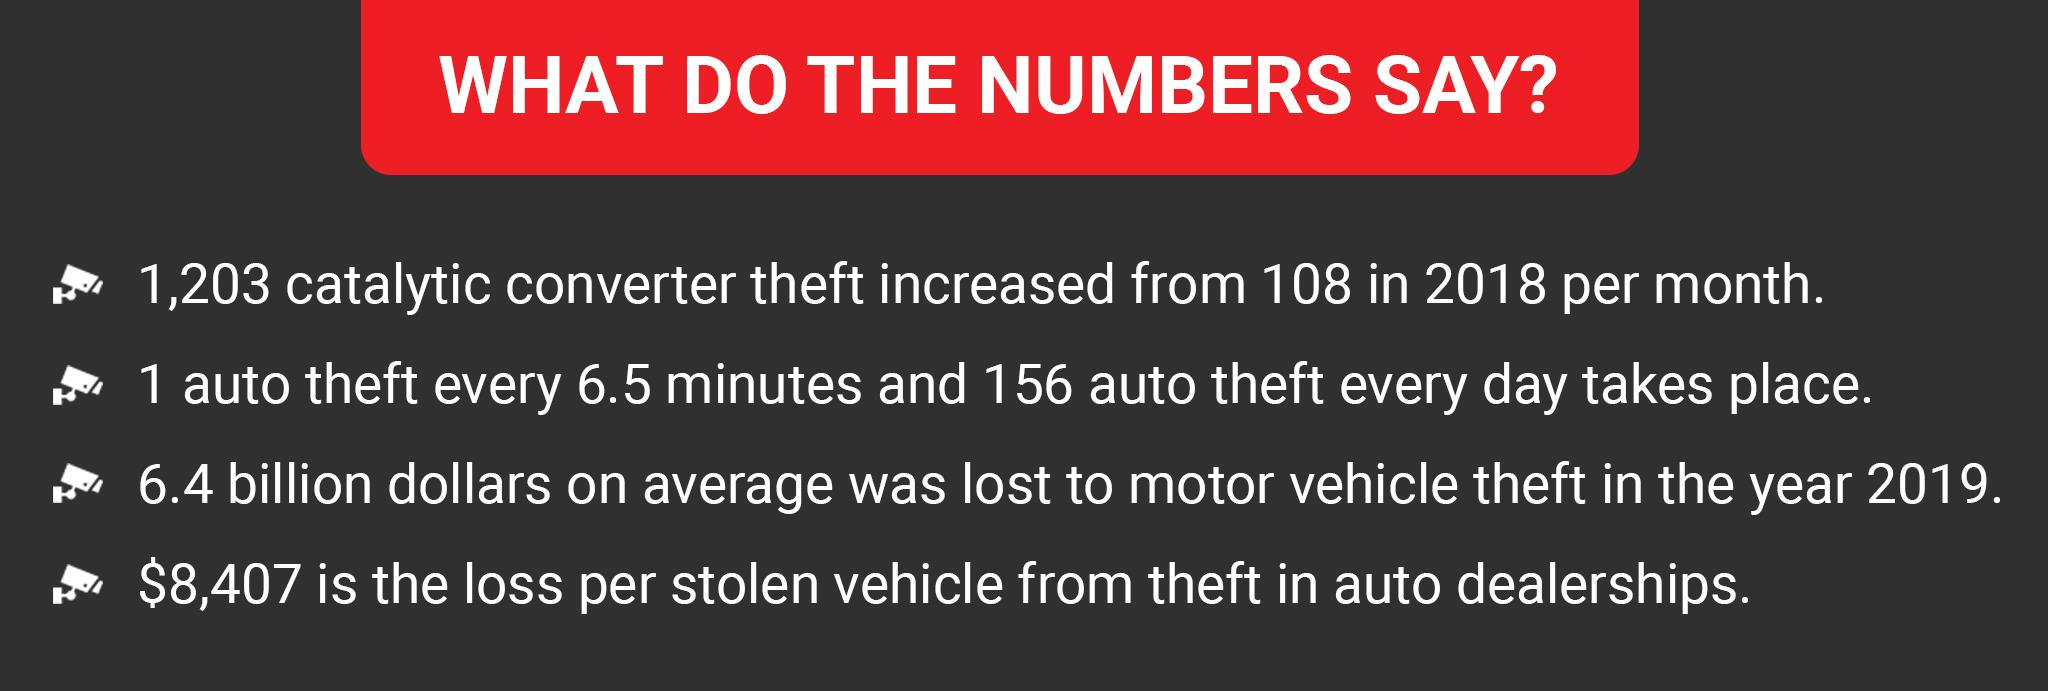 2021 Vehicle Theft Statistics